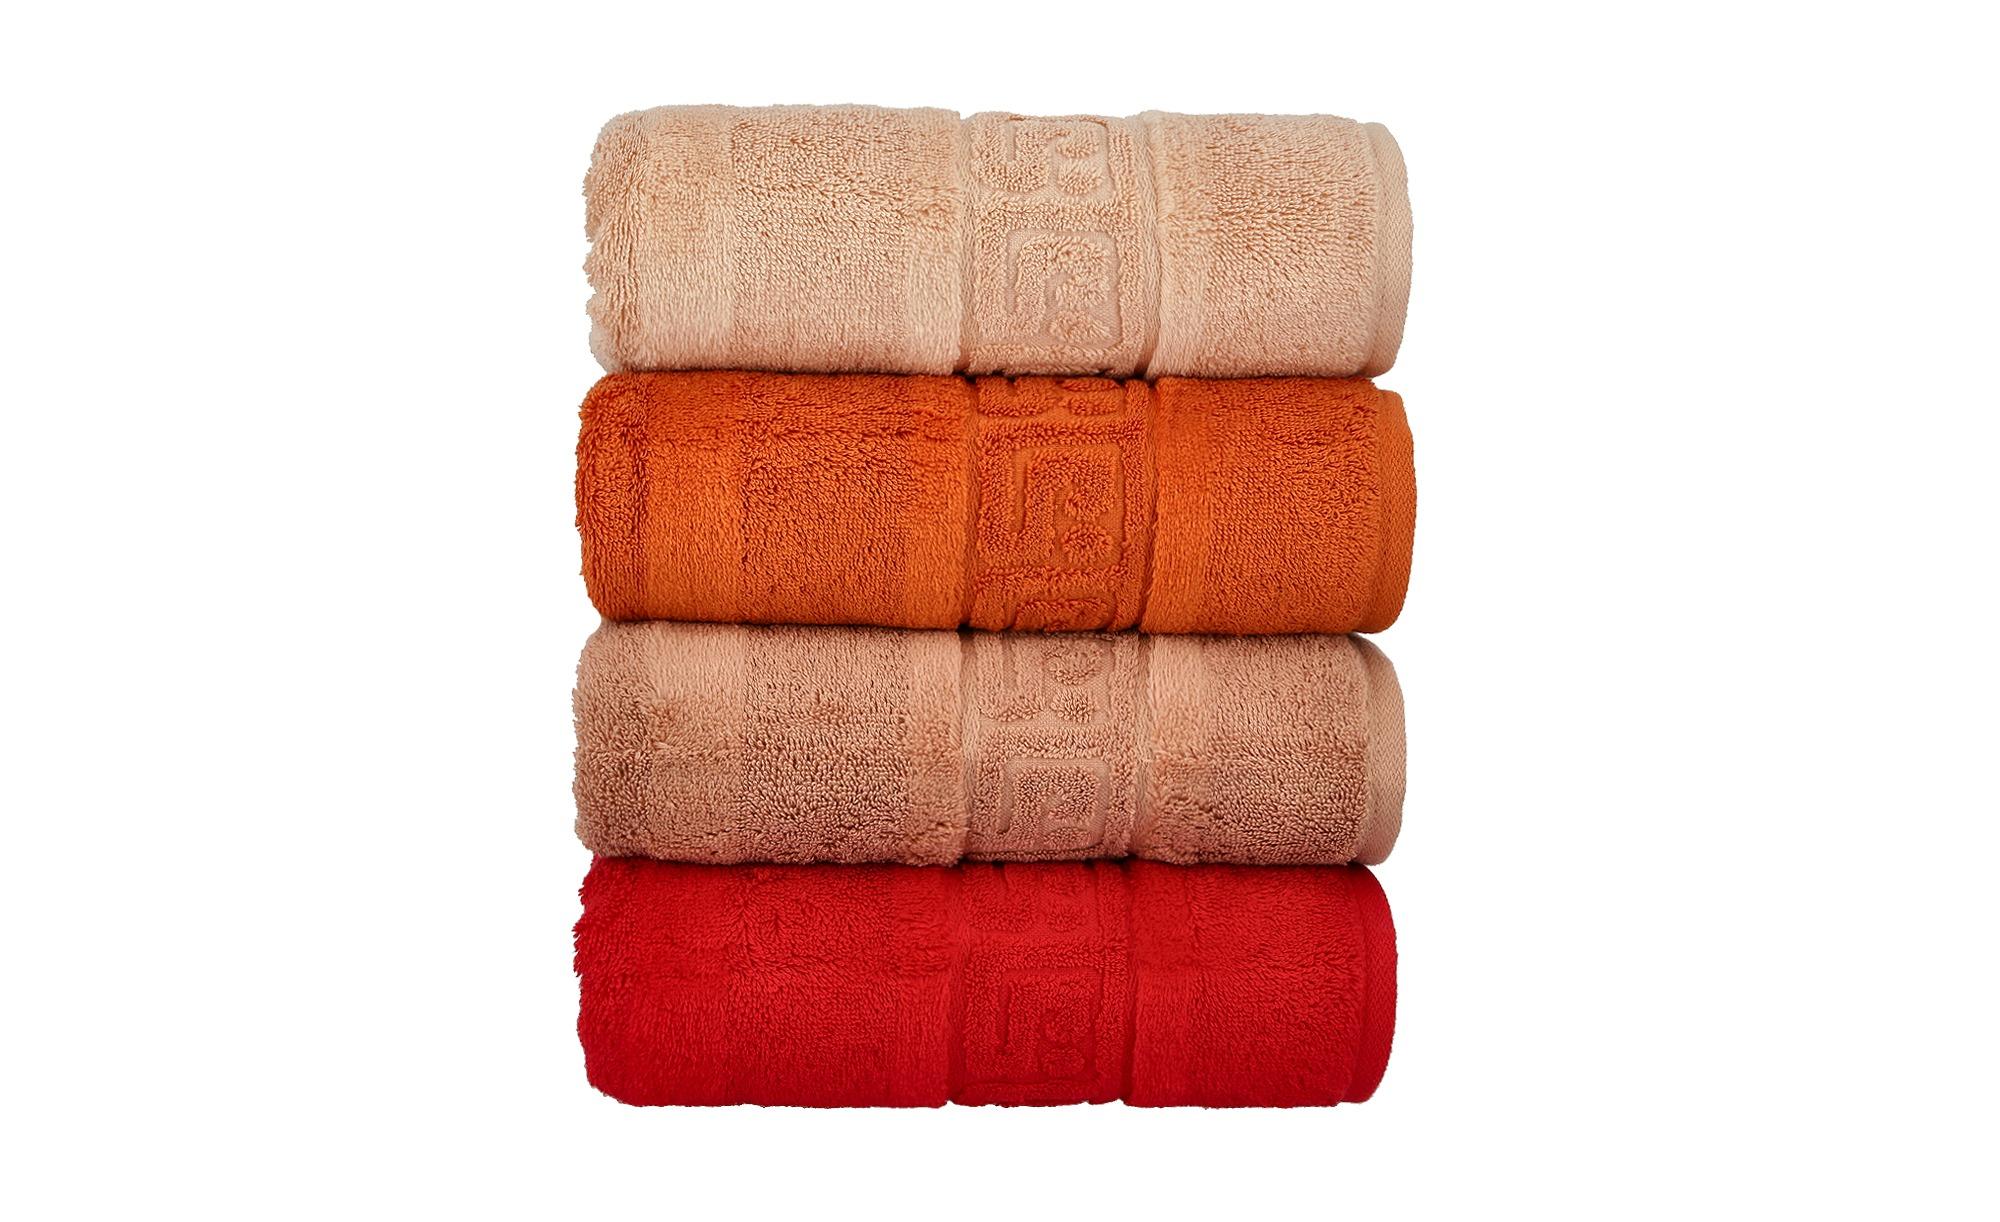 CaWö Duschtuch  1001 ¦ rosa/pink ¦ 100% Baumwolle ¦ Maße (cm): B: 80 Badtextilien und Zubehör > Handtücher & Badetücher > Duschtücher - Höffner